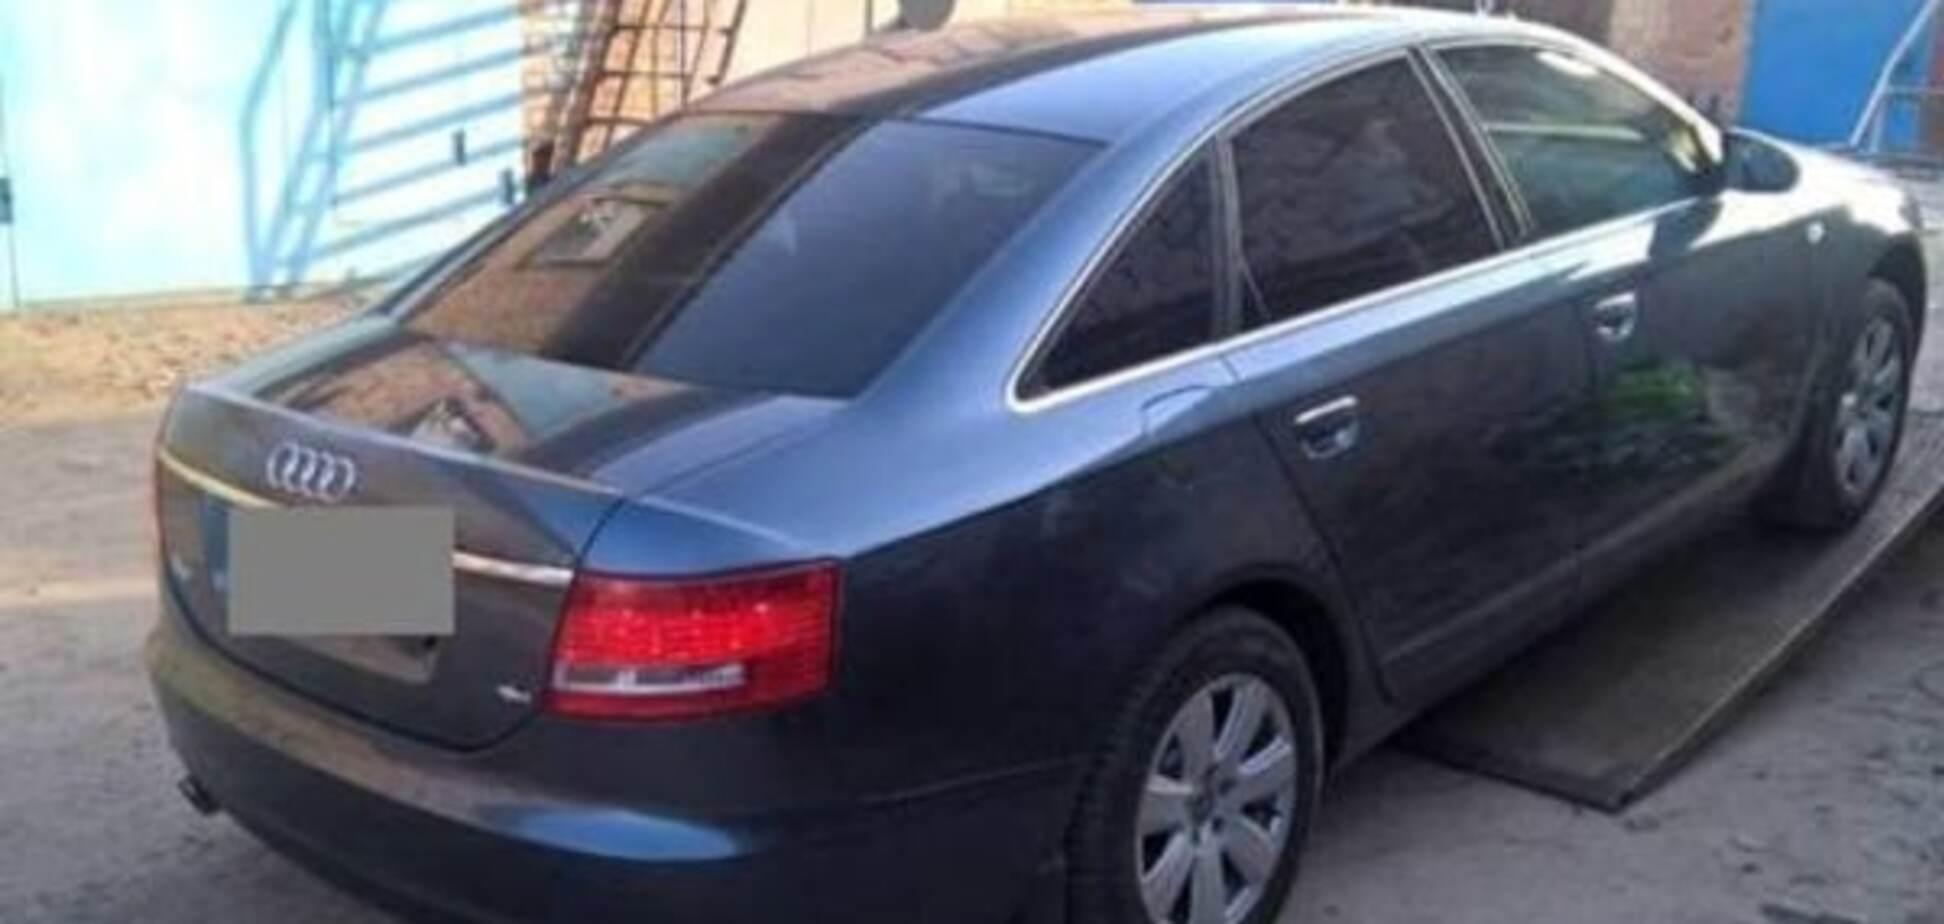 автомобиль Познякова